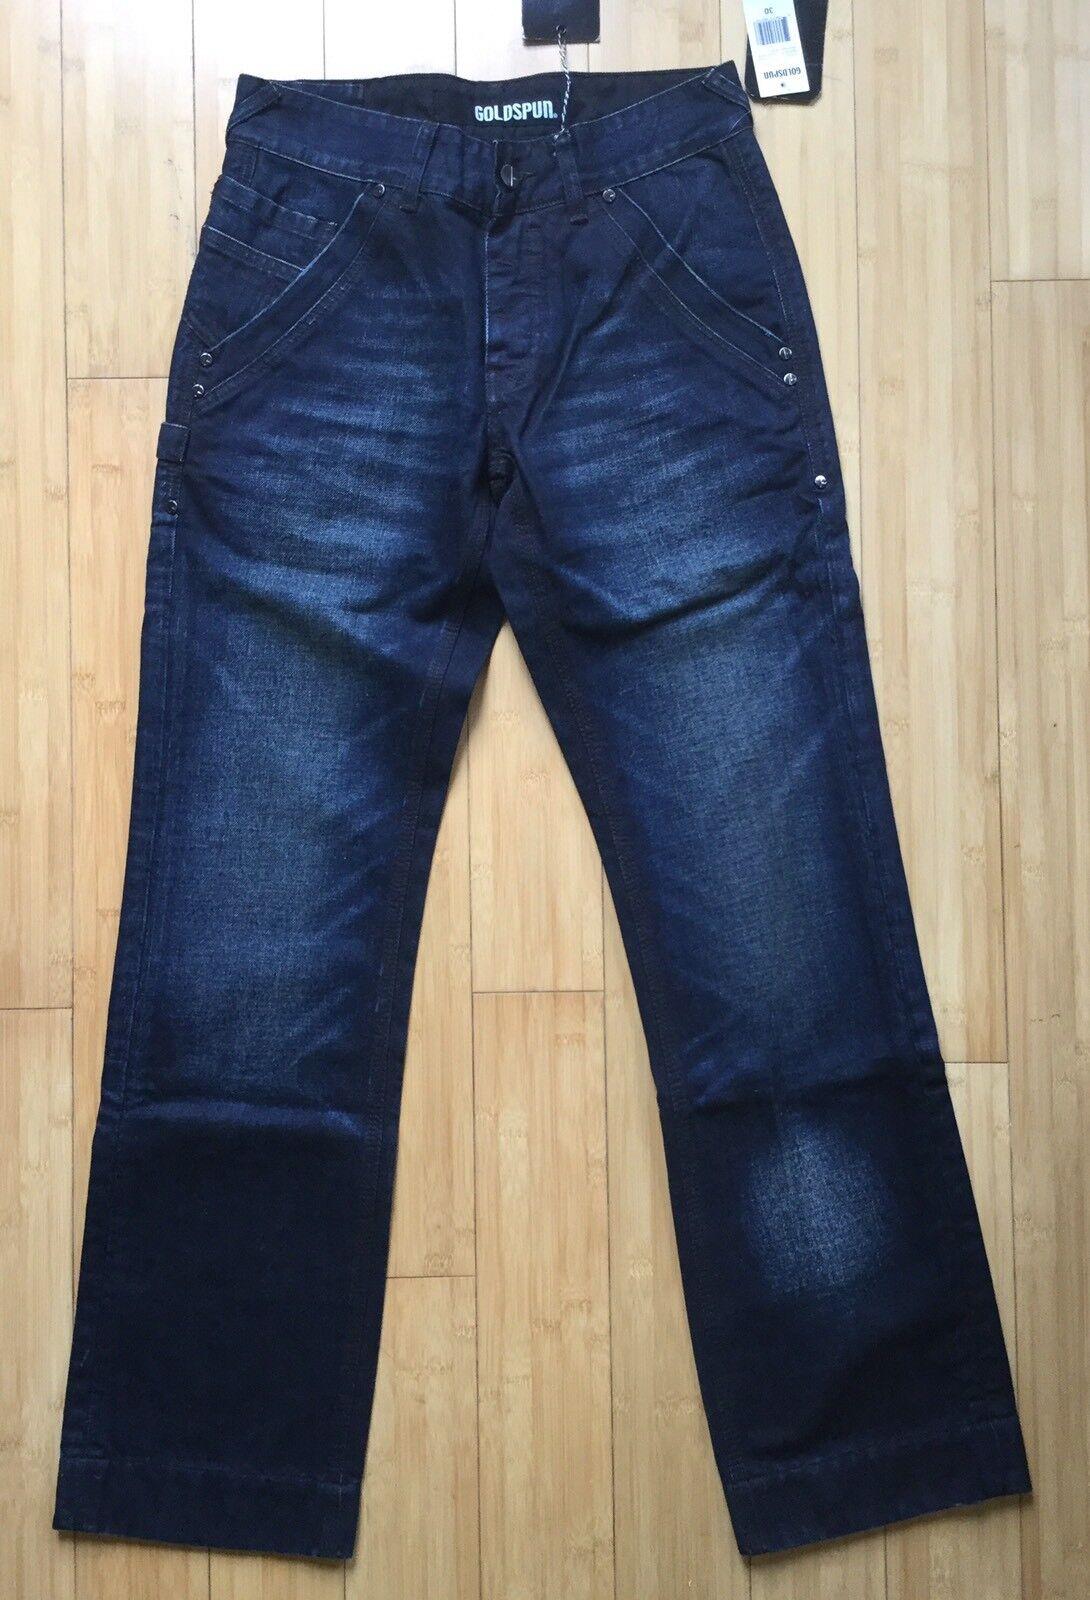 NWT goldspun Coup D'etat Mechanic Denim Jeans utility raw unwashed 29 x 32